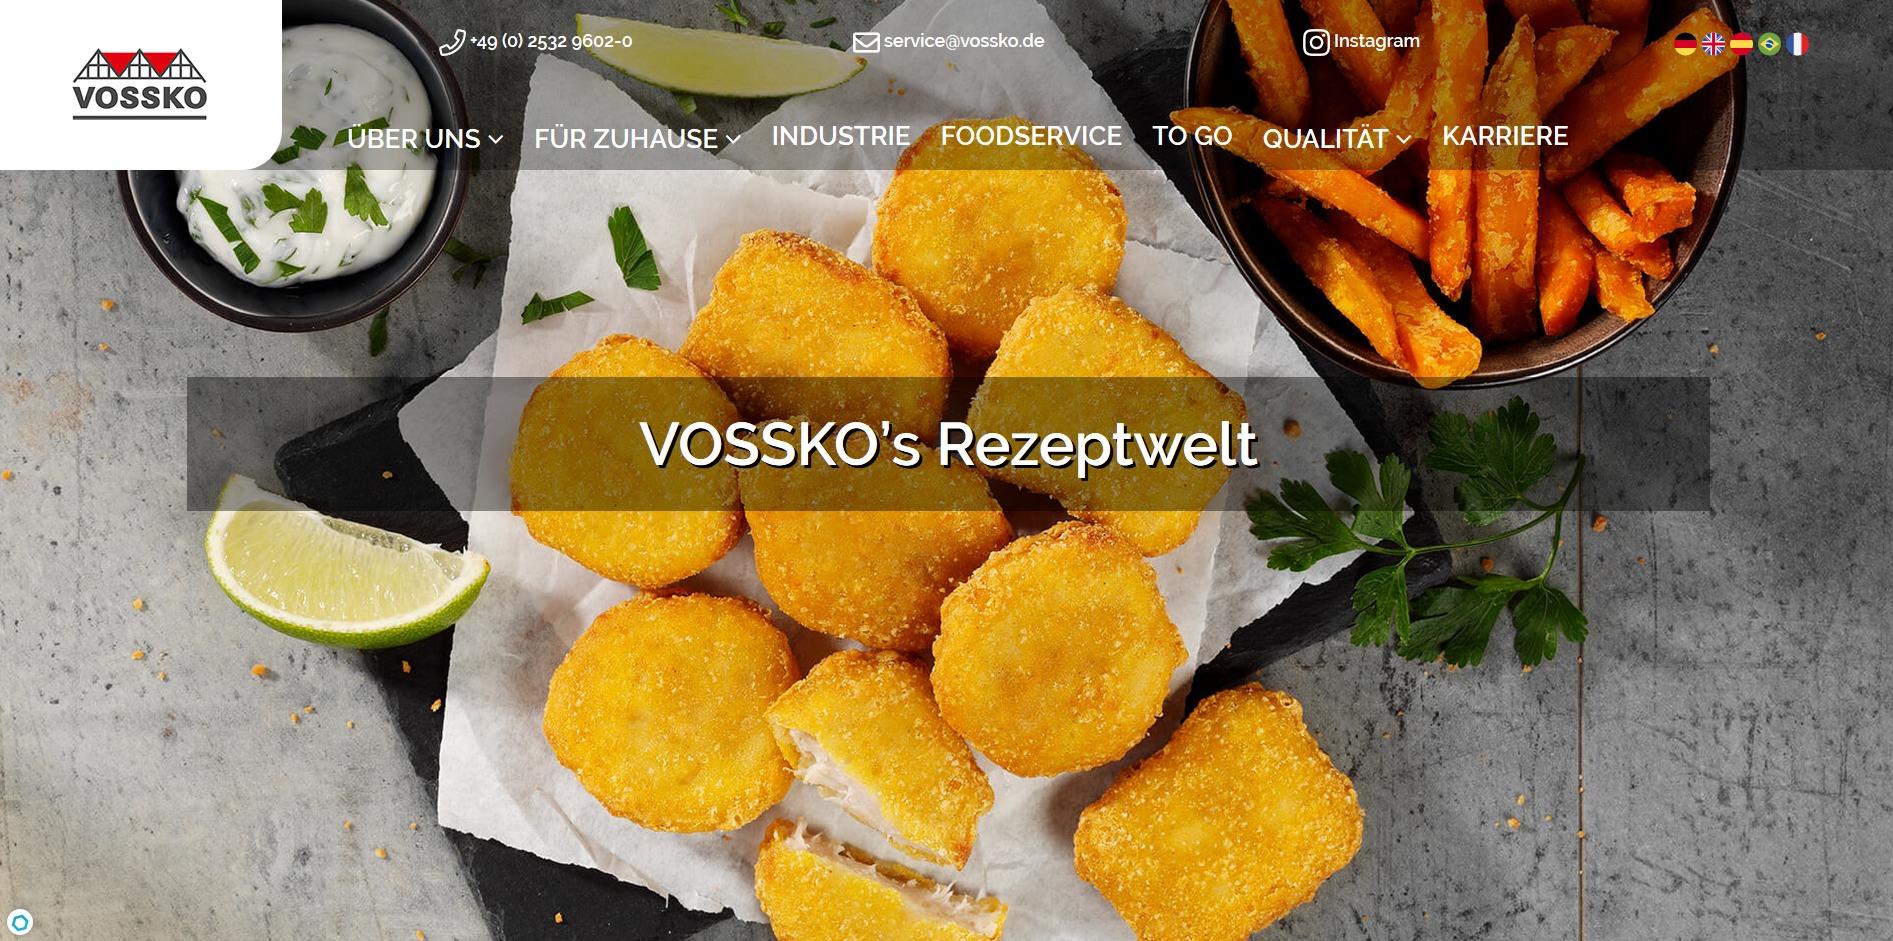 Vossko-Rezeptwelt